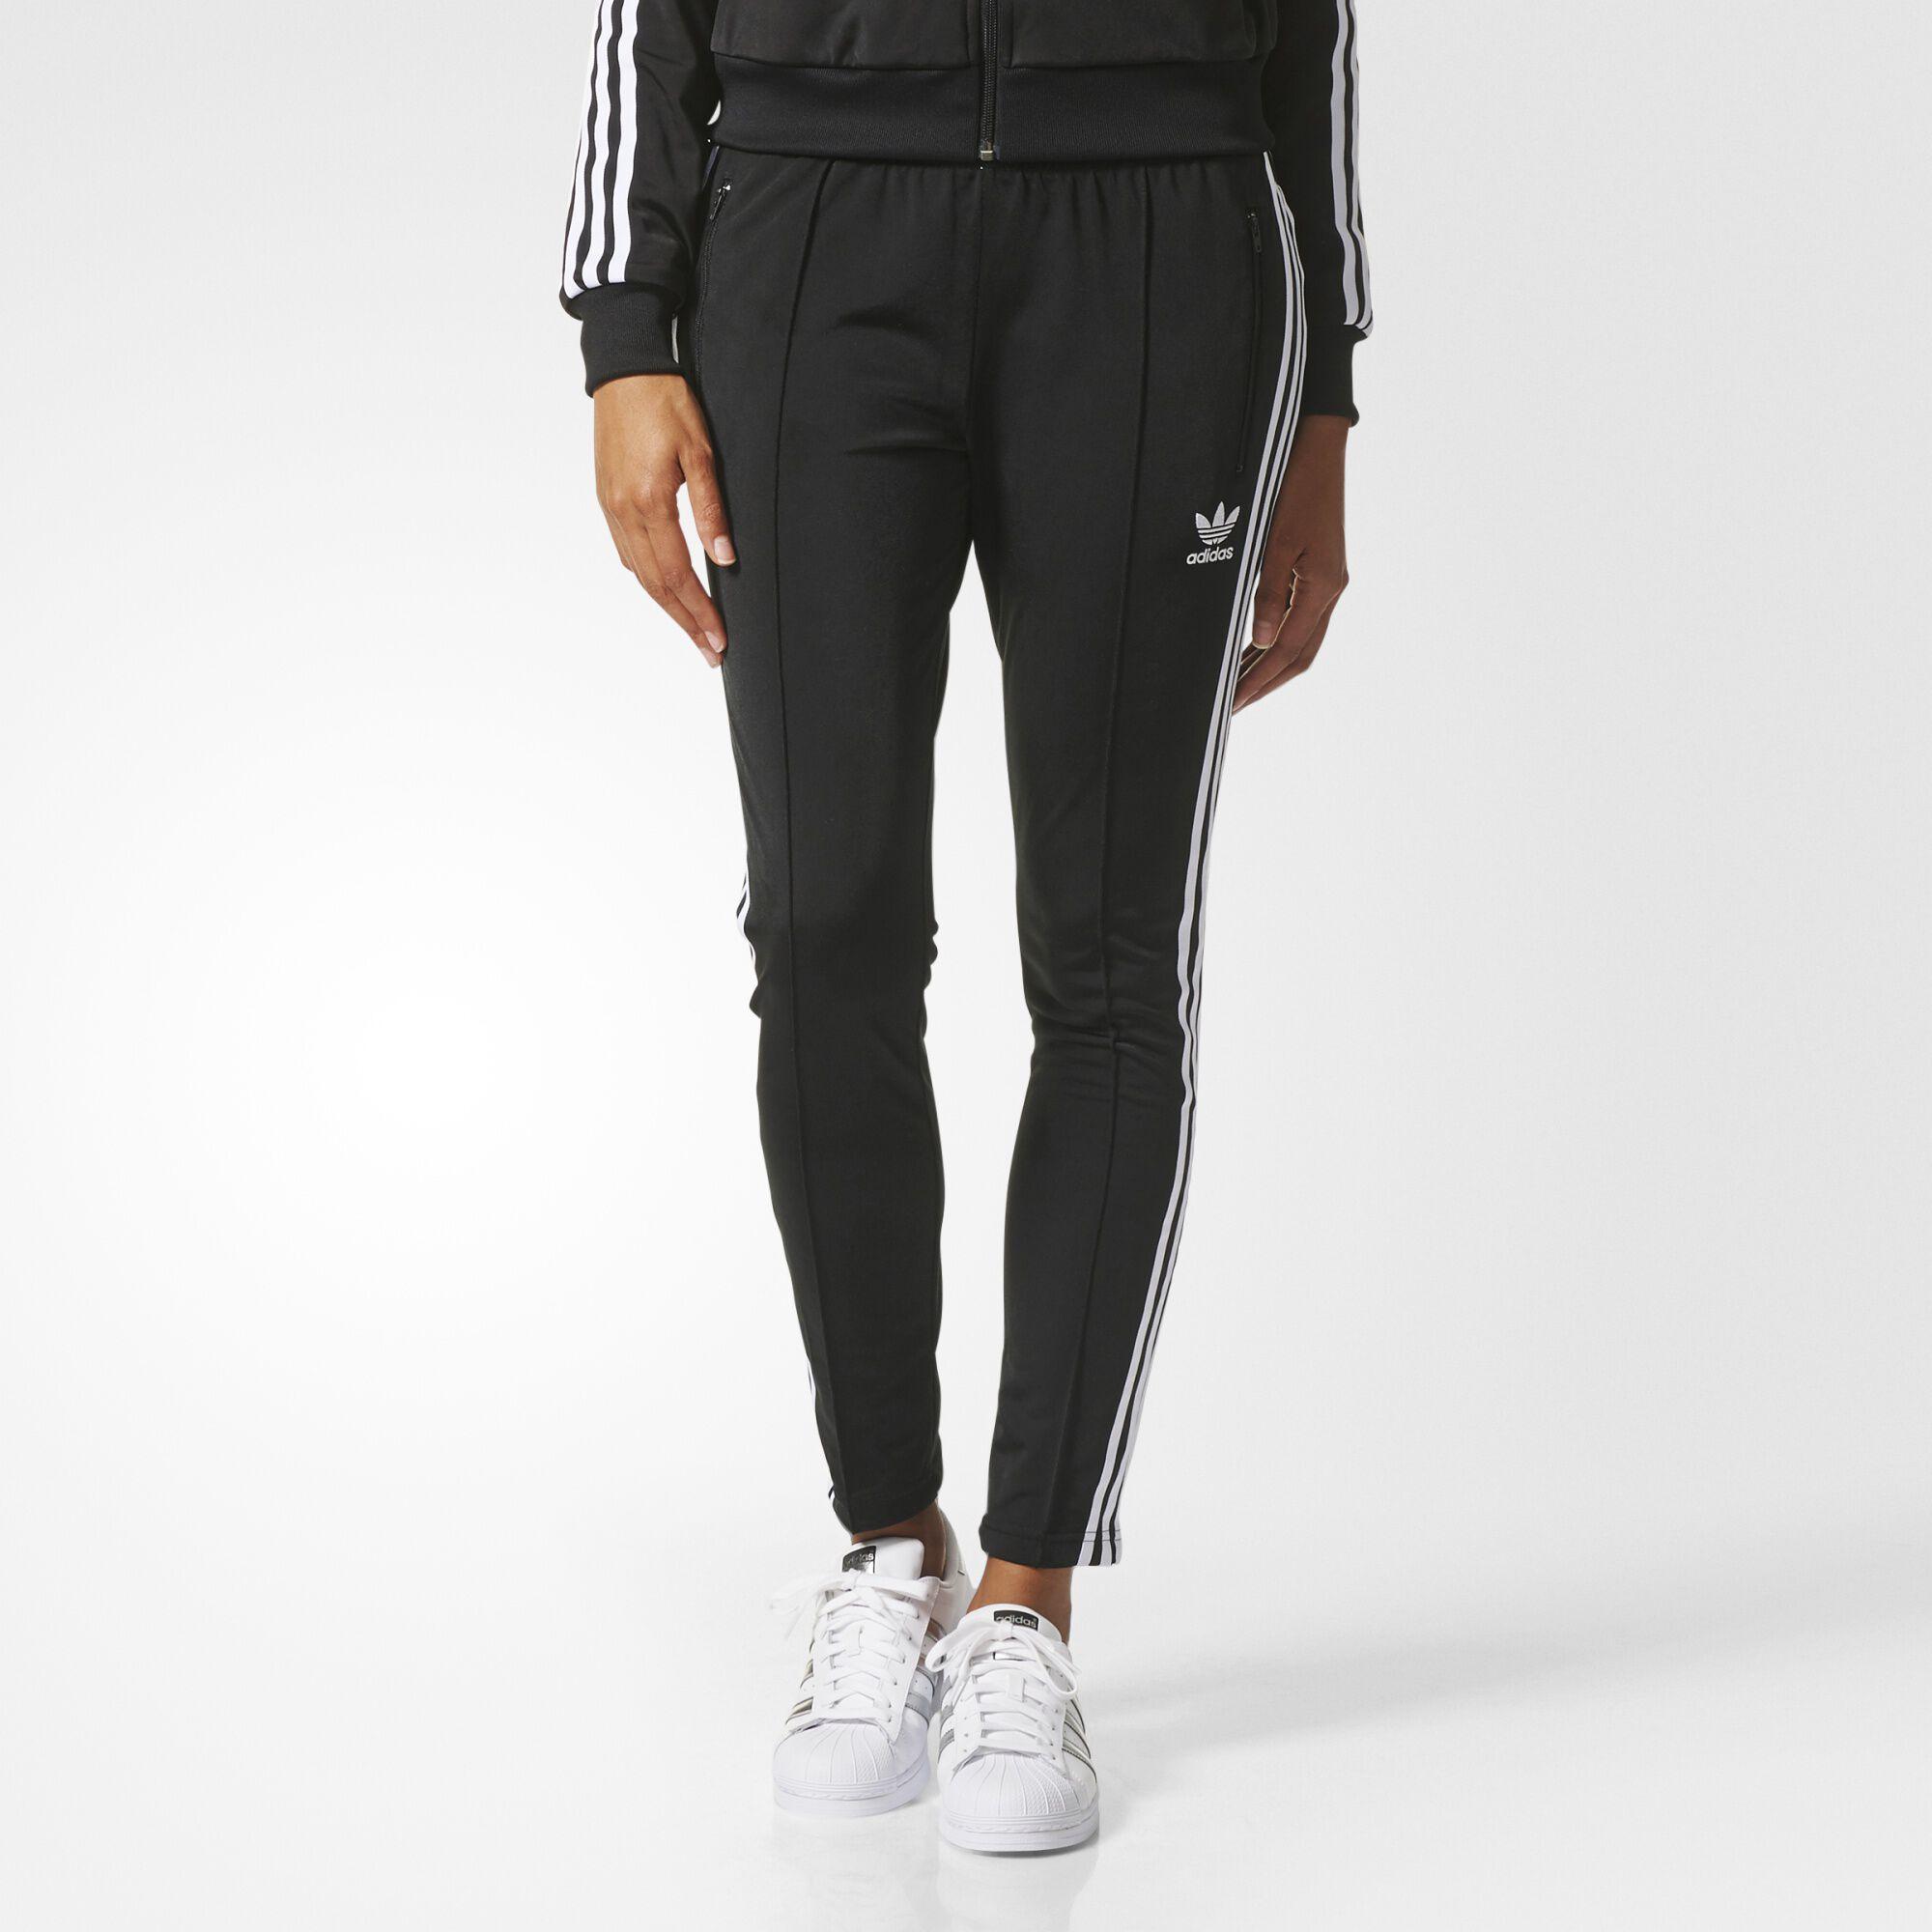 adidas superstar track pants black bk